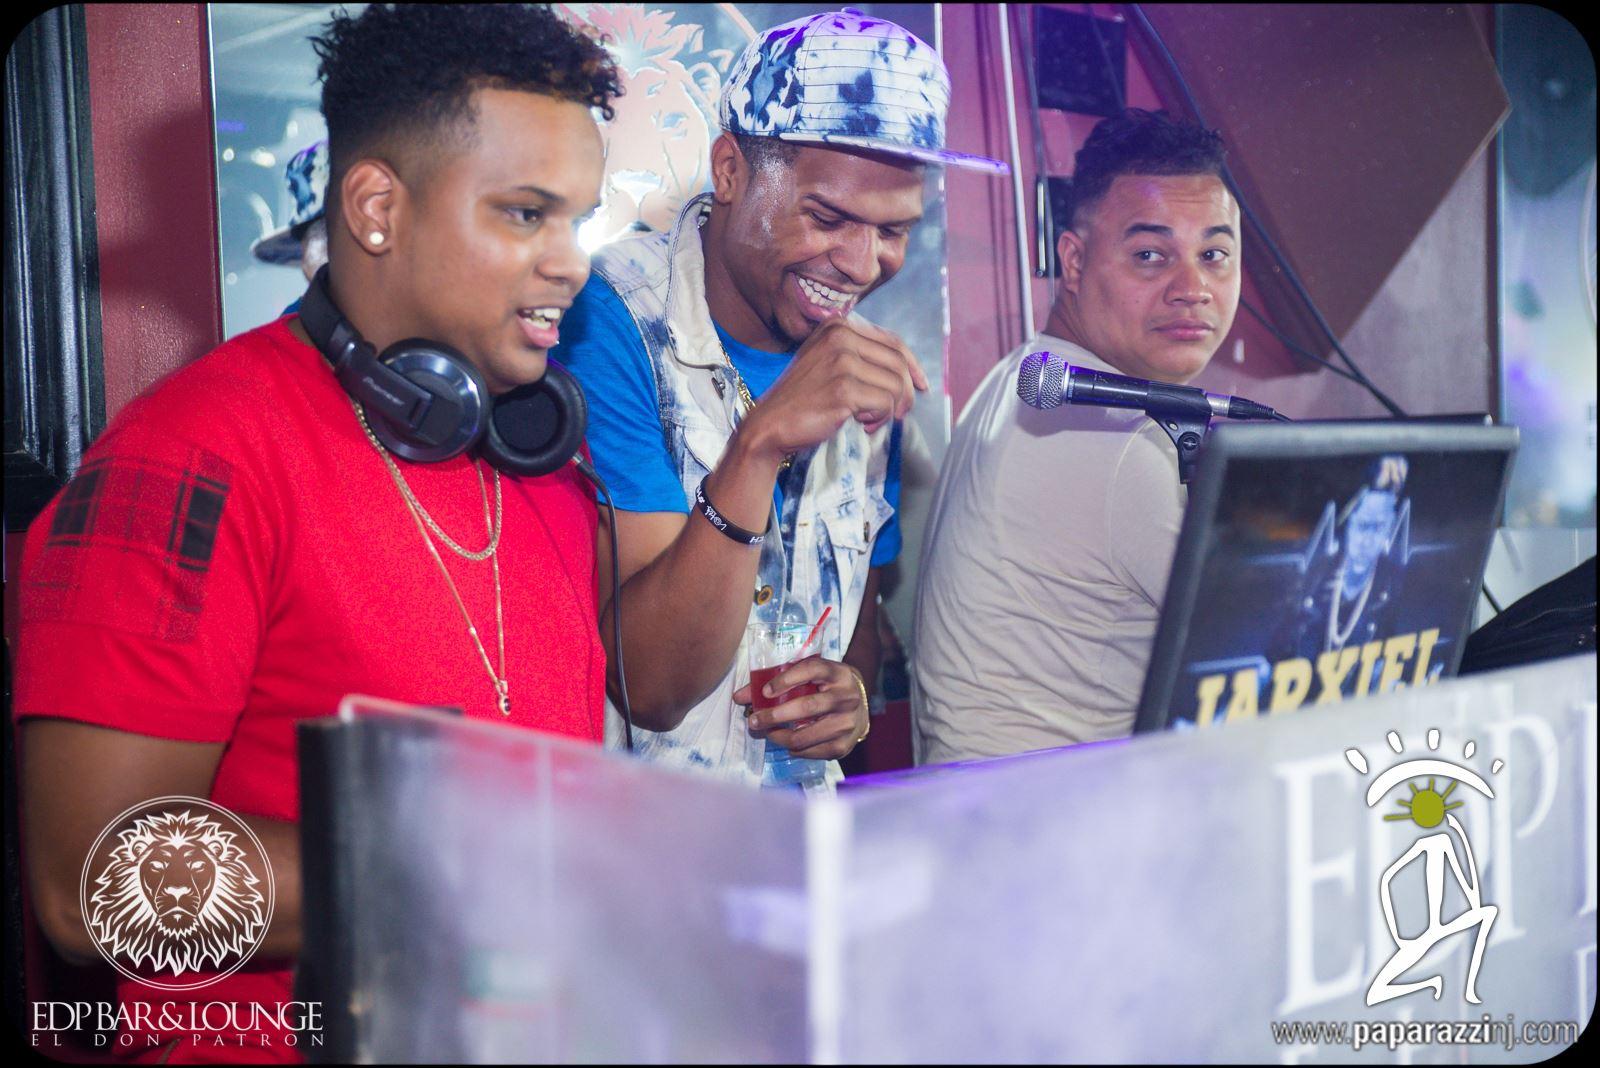 JAXIER  y  ON CUE DJS STAFF  en  EDP BAR Y LOUNGE